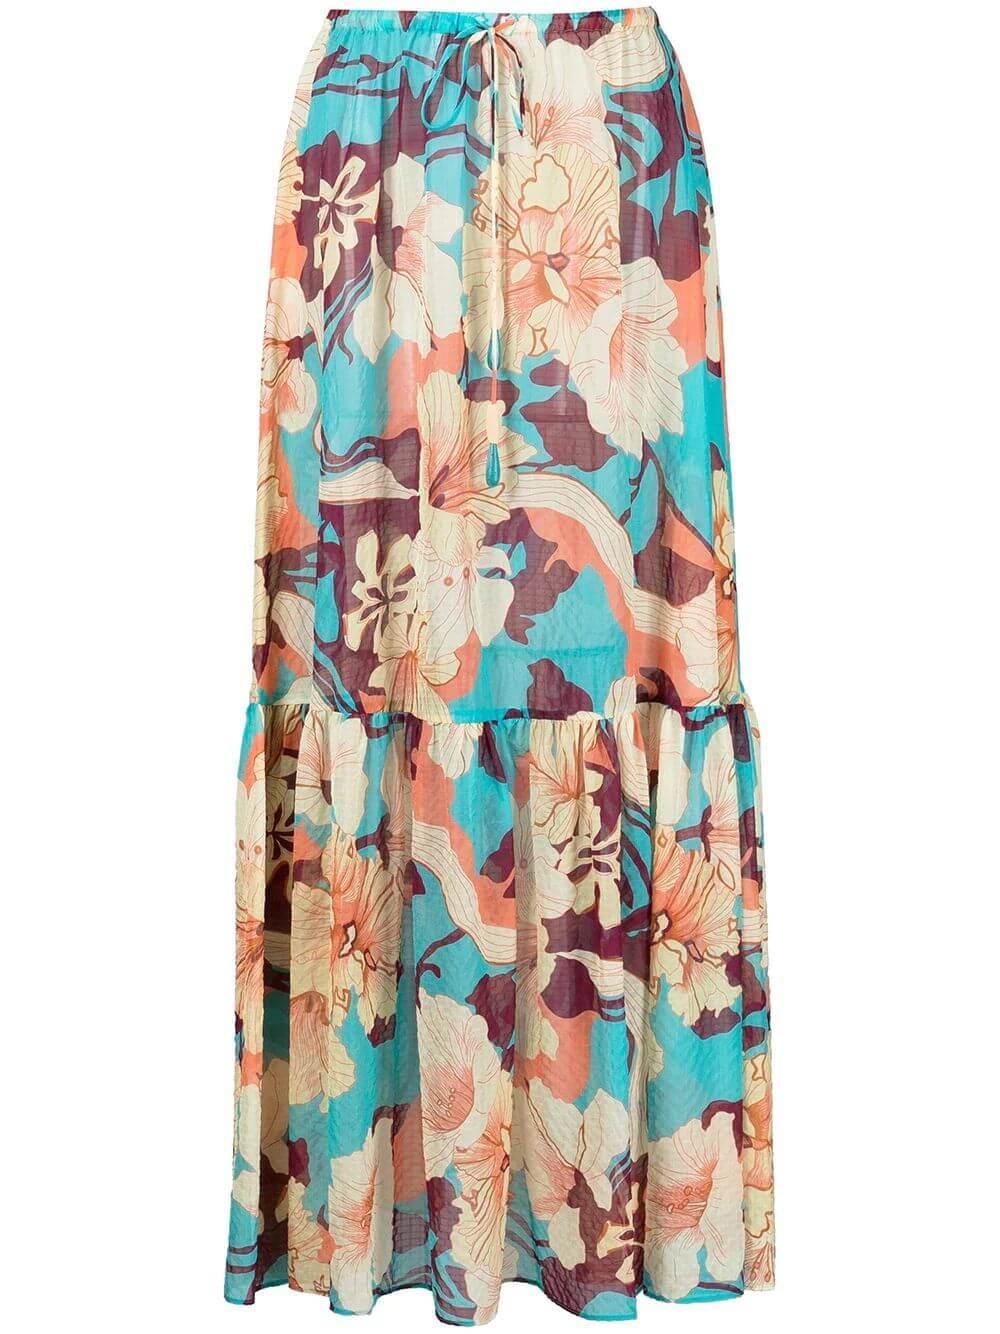 Lilith Maxi Skirt Item # A5210902-6755